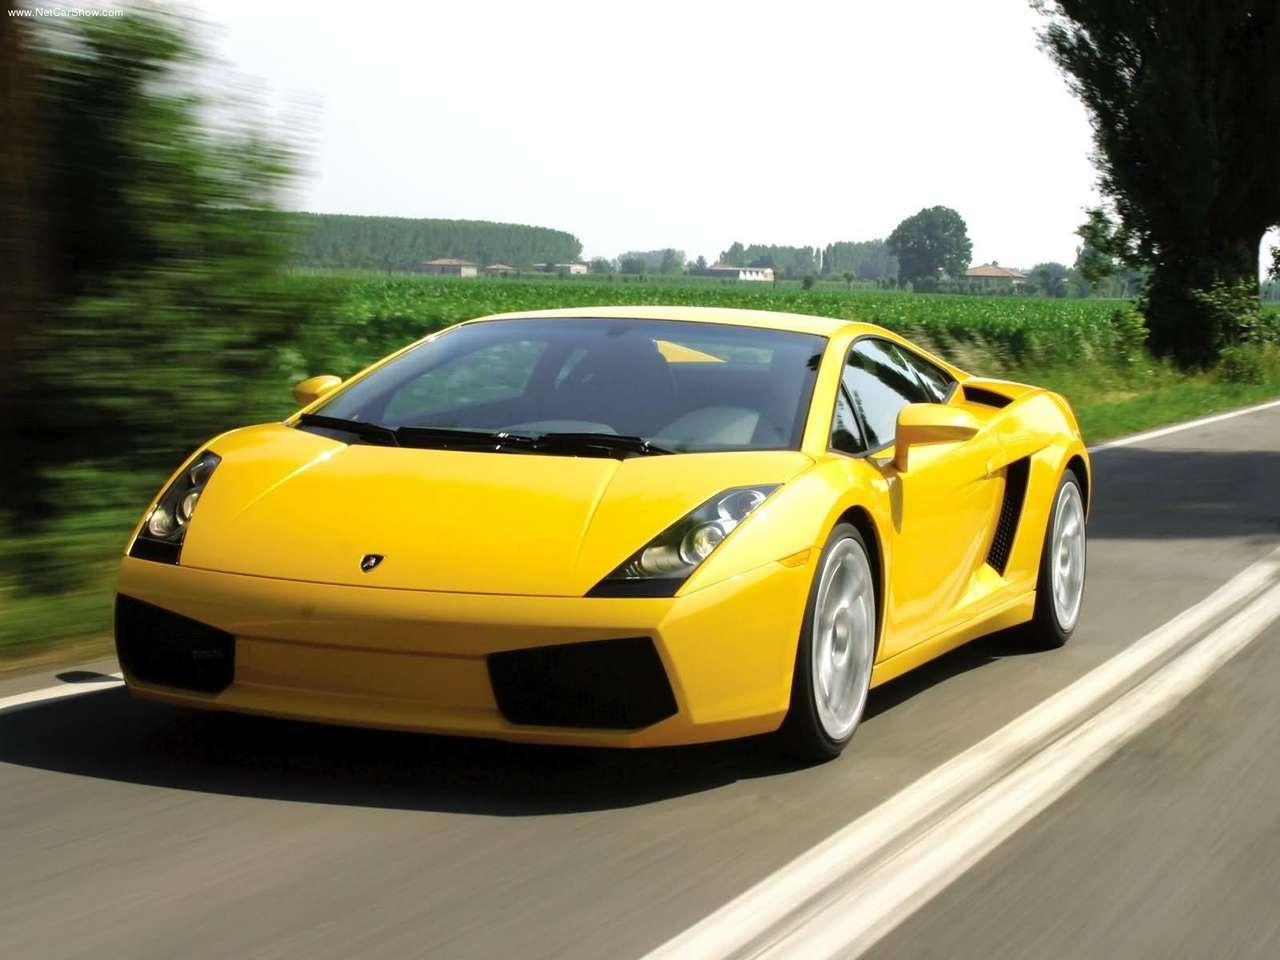 lamborghini gallardo wallpaper 5834 hd wallpapers in cars imagesci - Yellow Lamborghini Gallardo Spyder Wallpaper